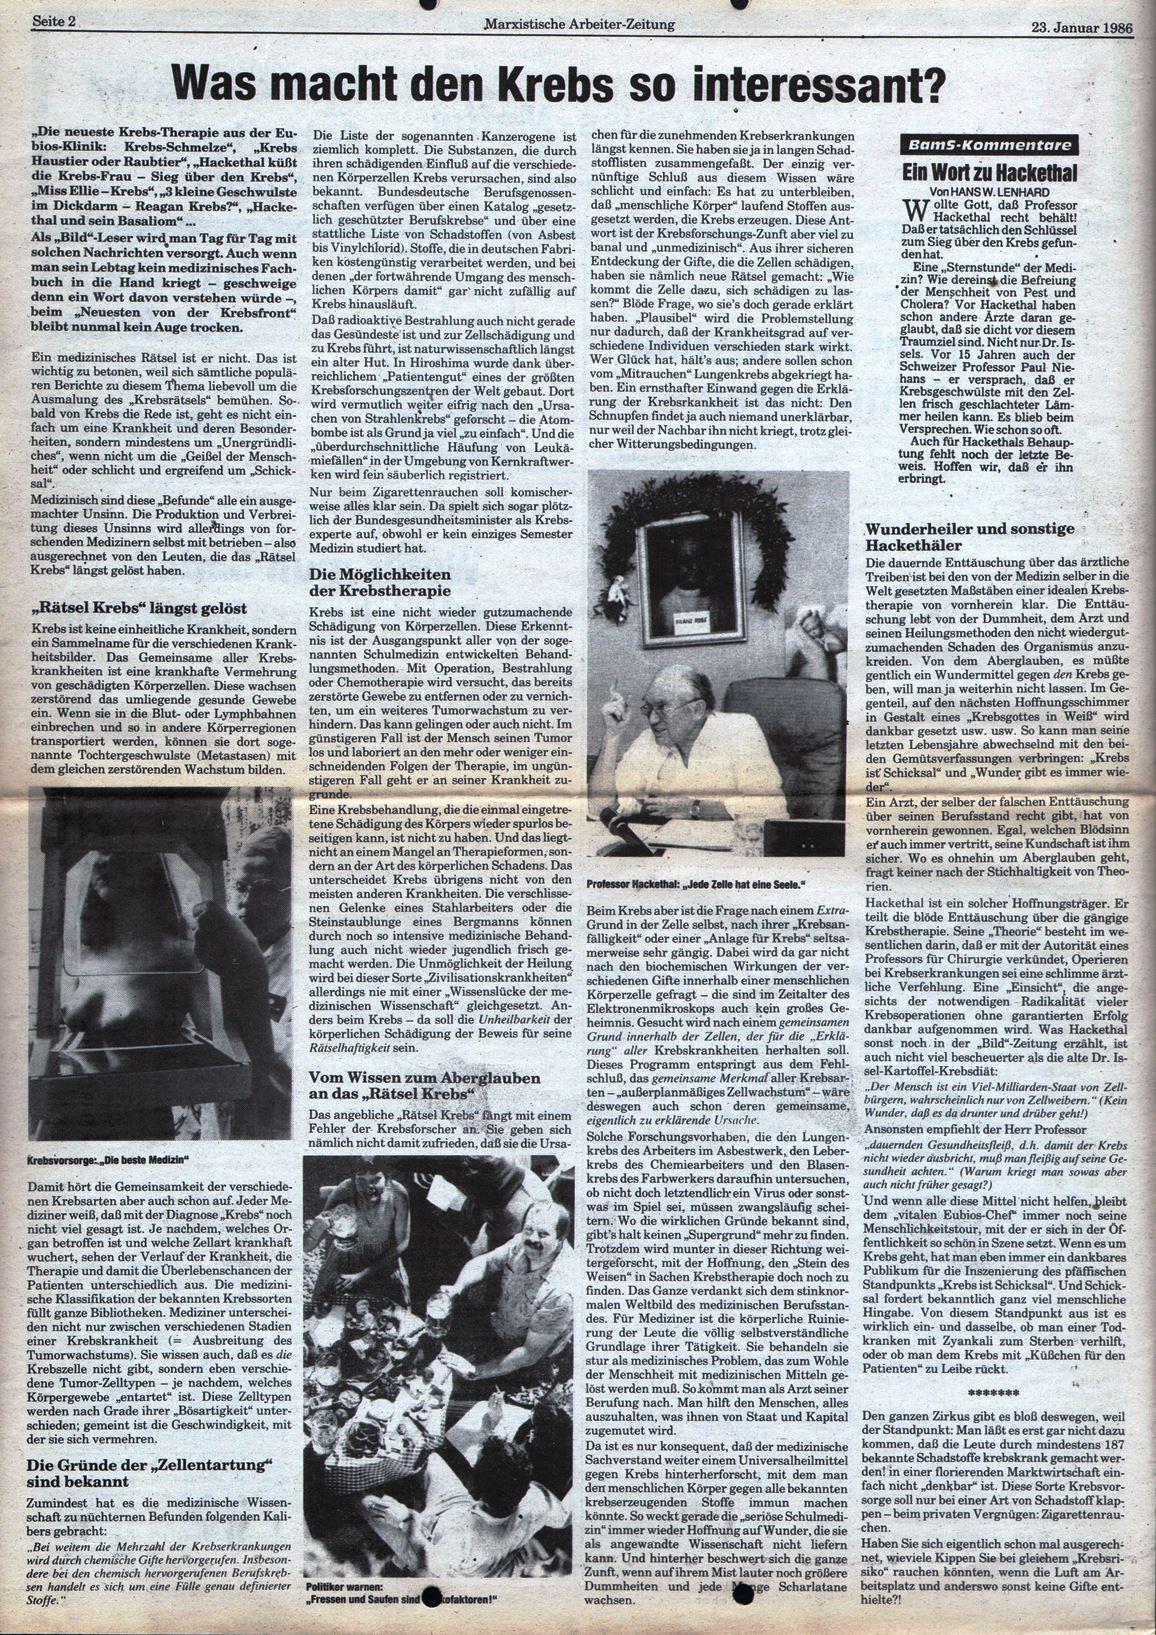 Muenchen_MG_MAZ_Krauss_Maffei_19860123_02